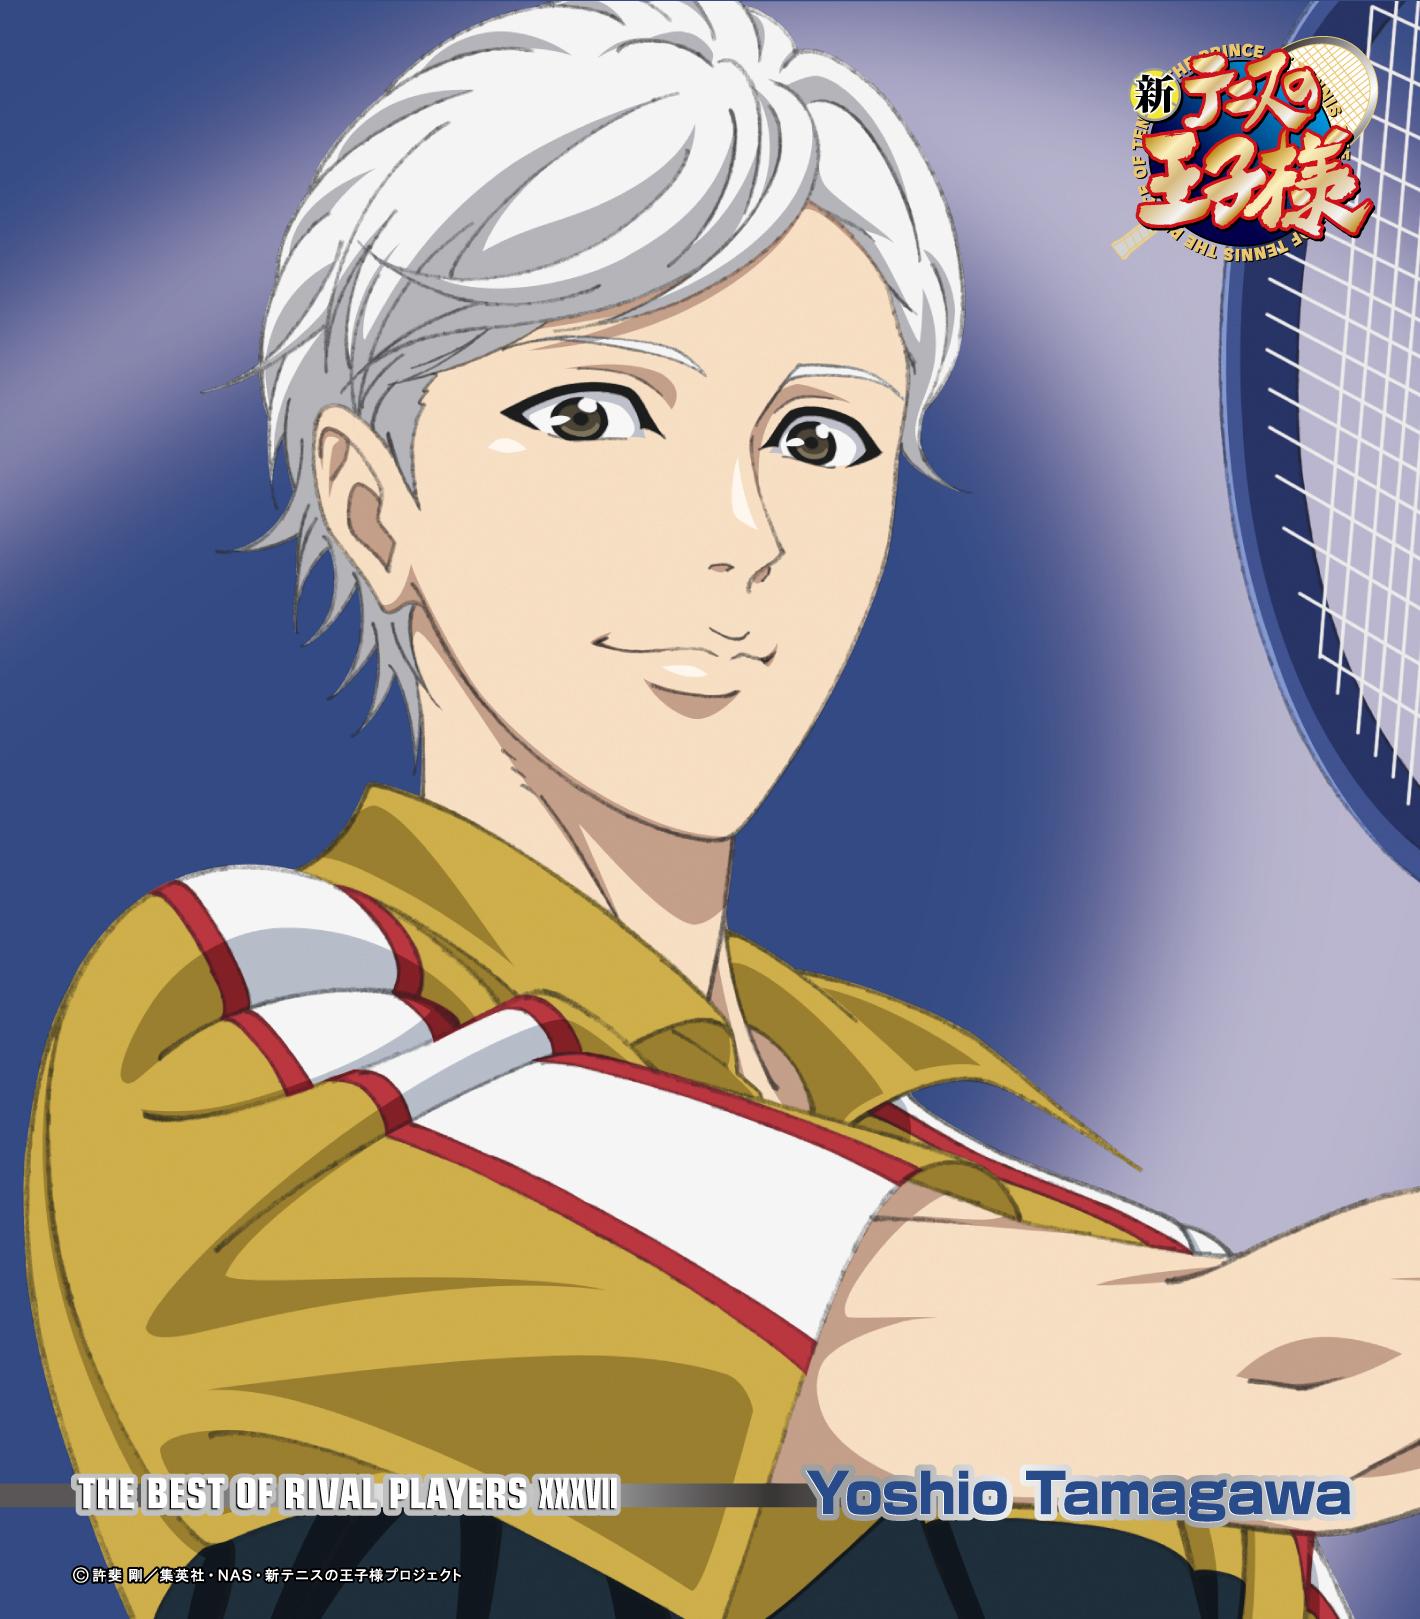 「THE BEST OF RIVAL PLAYERS XXXVII Yoshio Tamagawa」玉川よしお